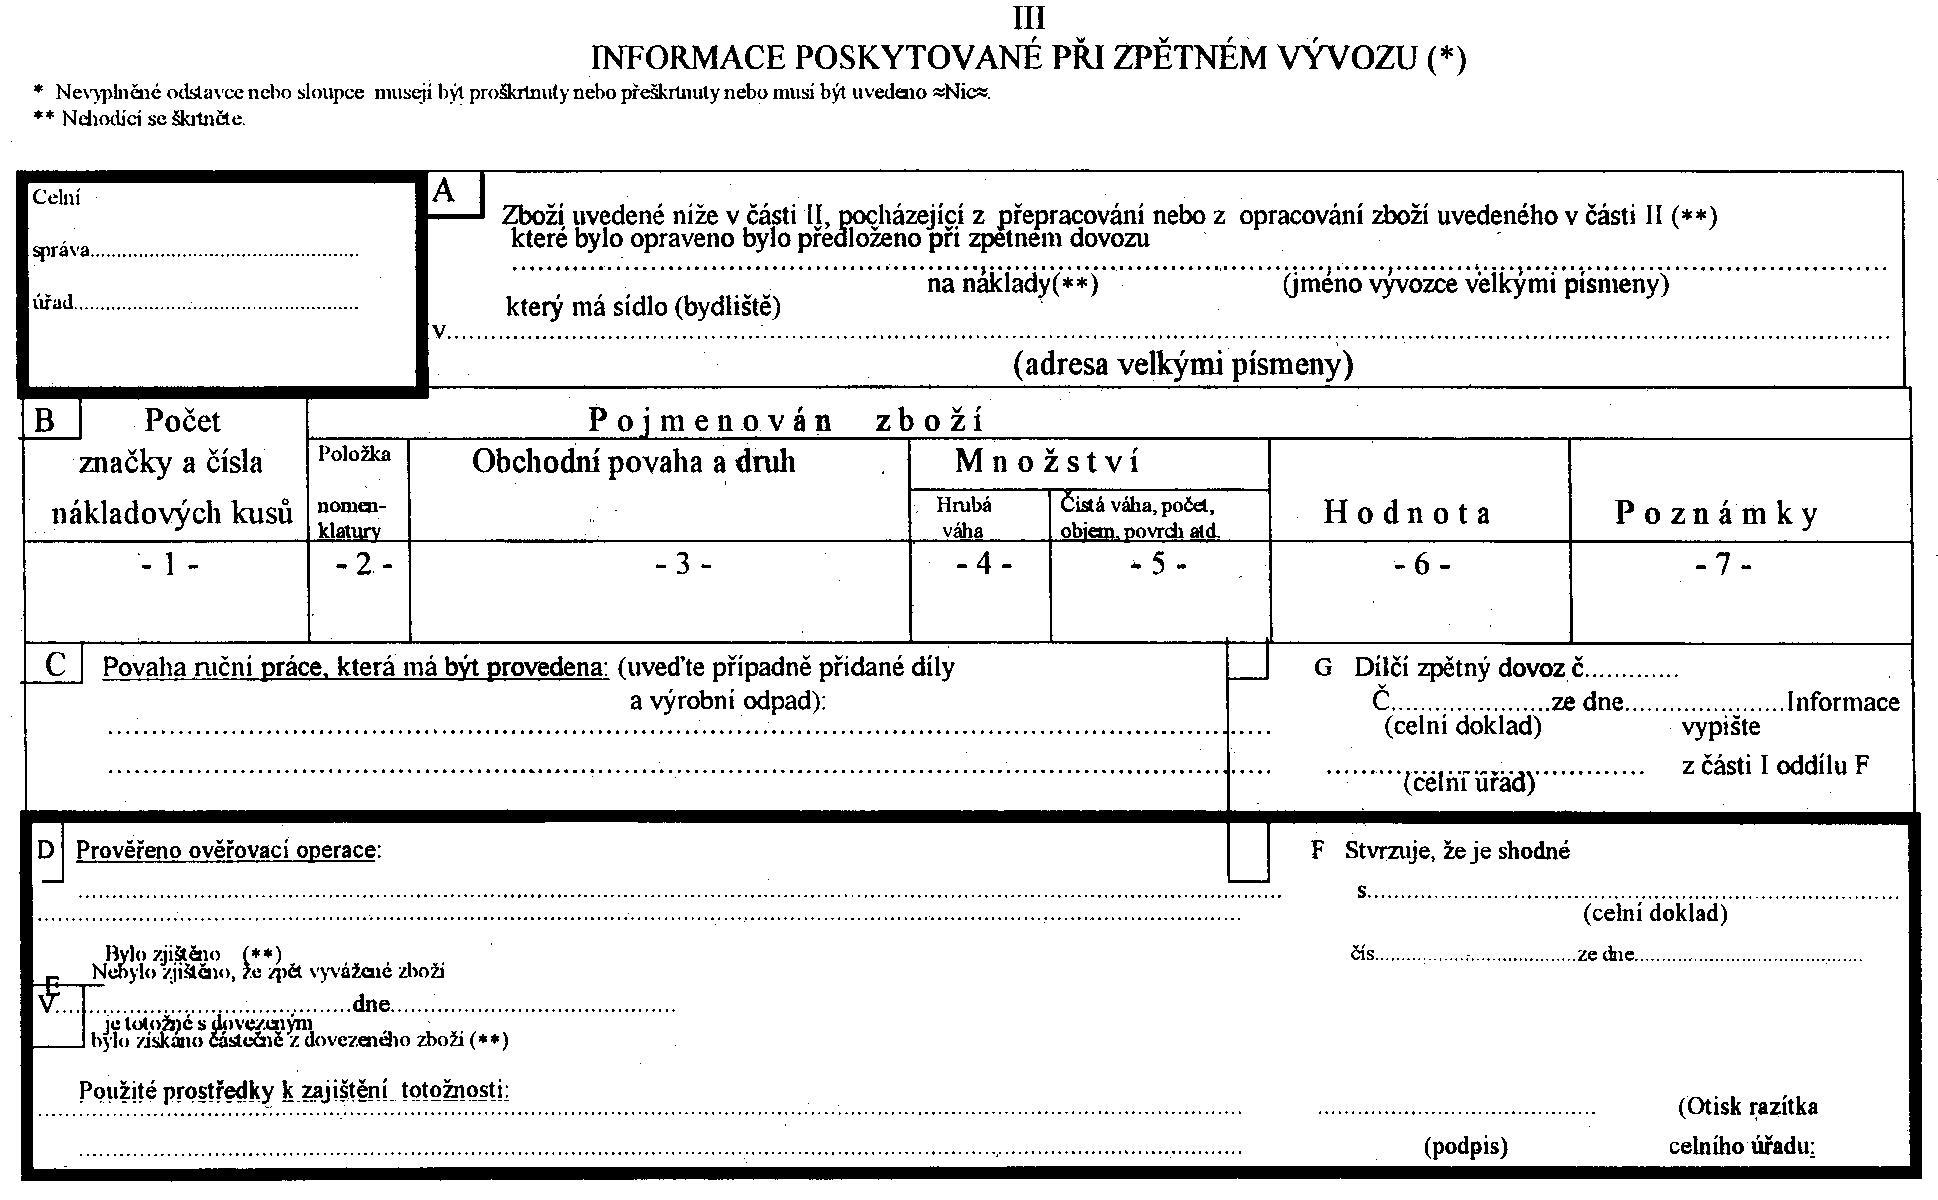 e27a7c1a905 Vyhláška 135 1998 Sb. -